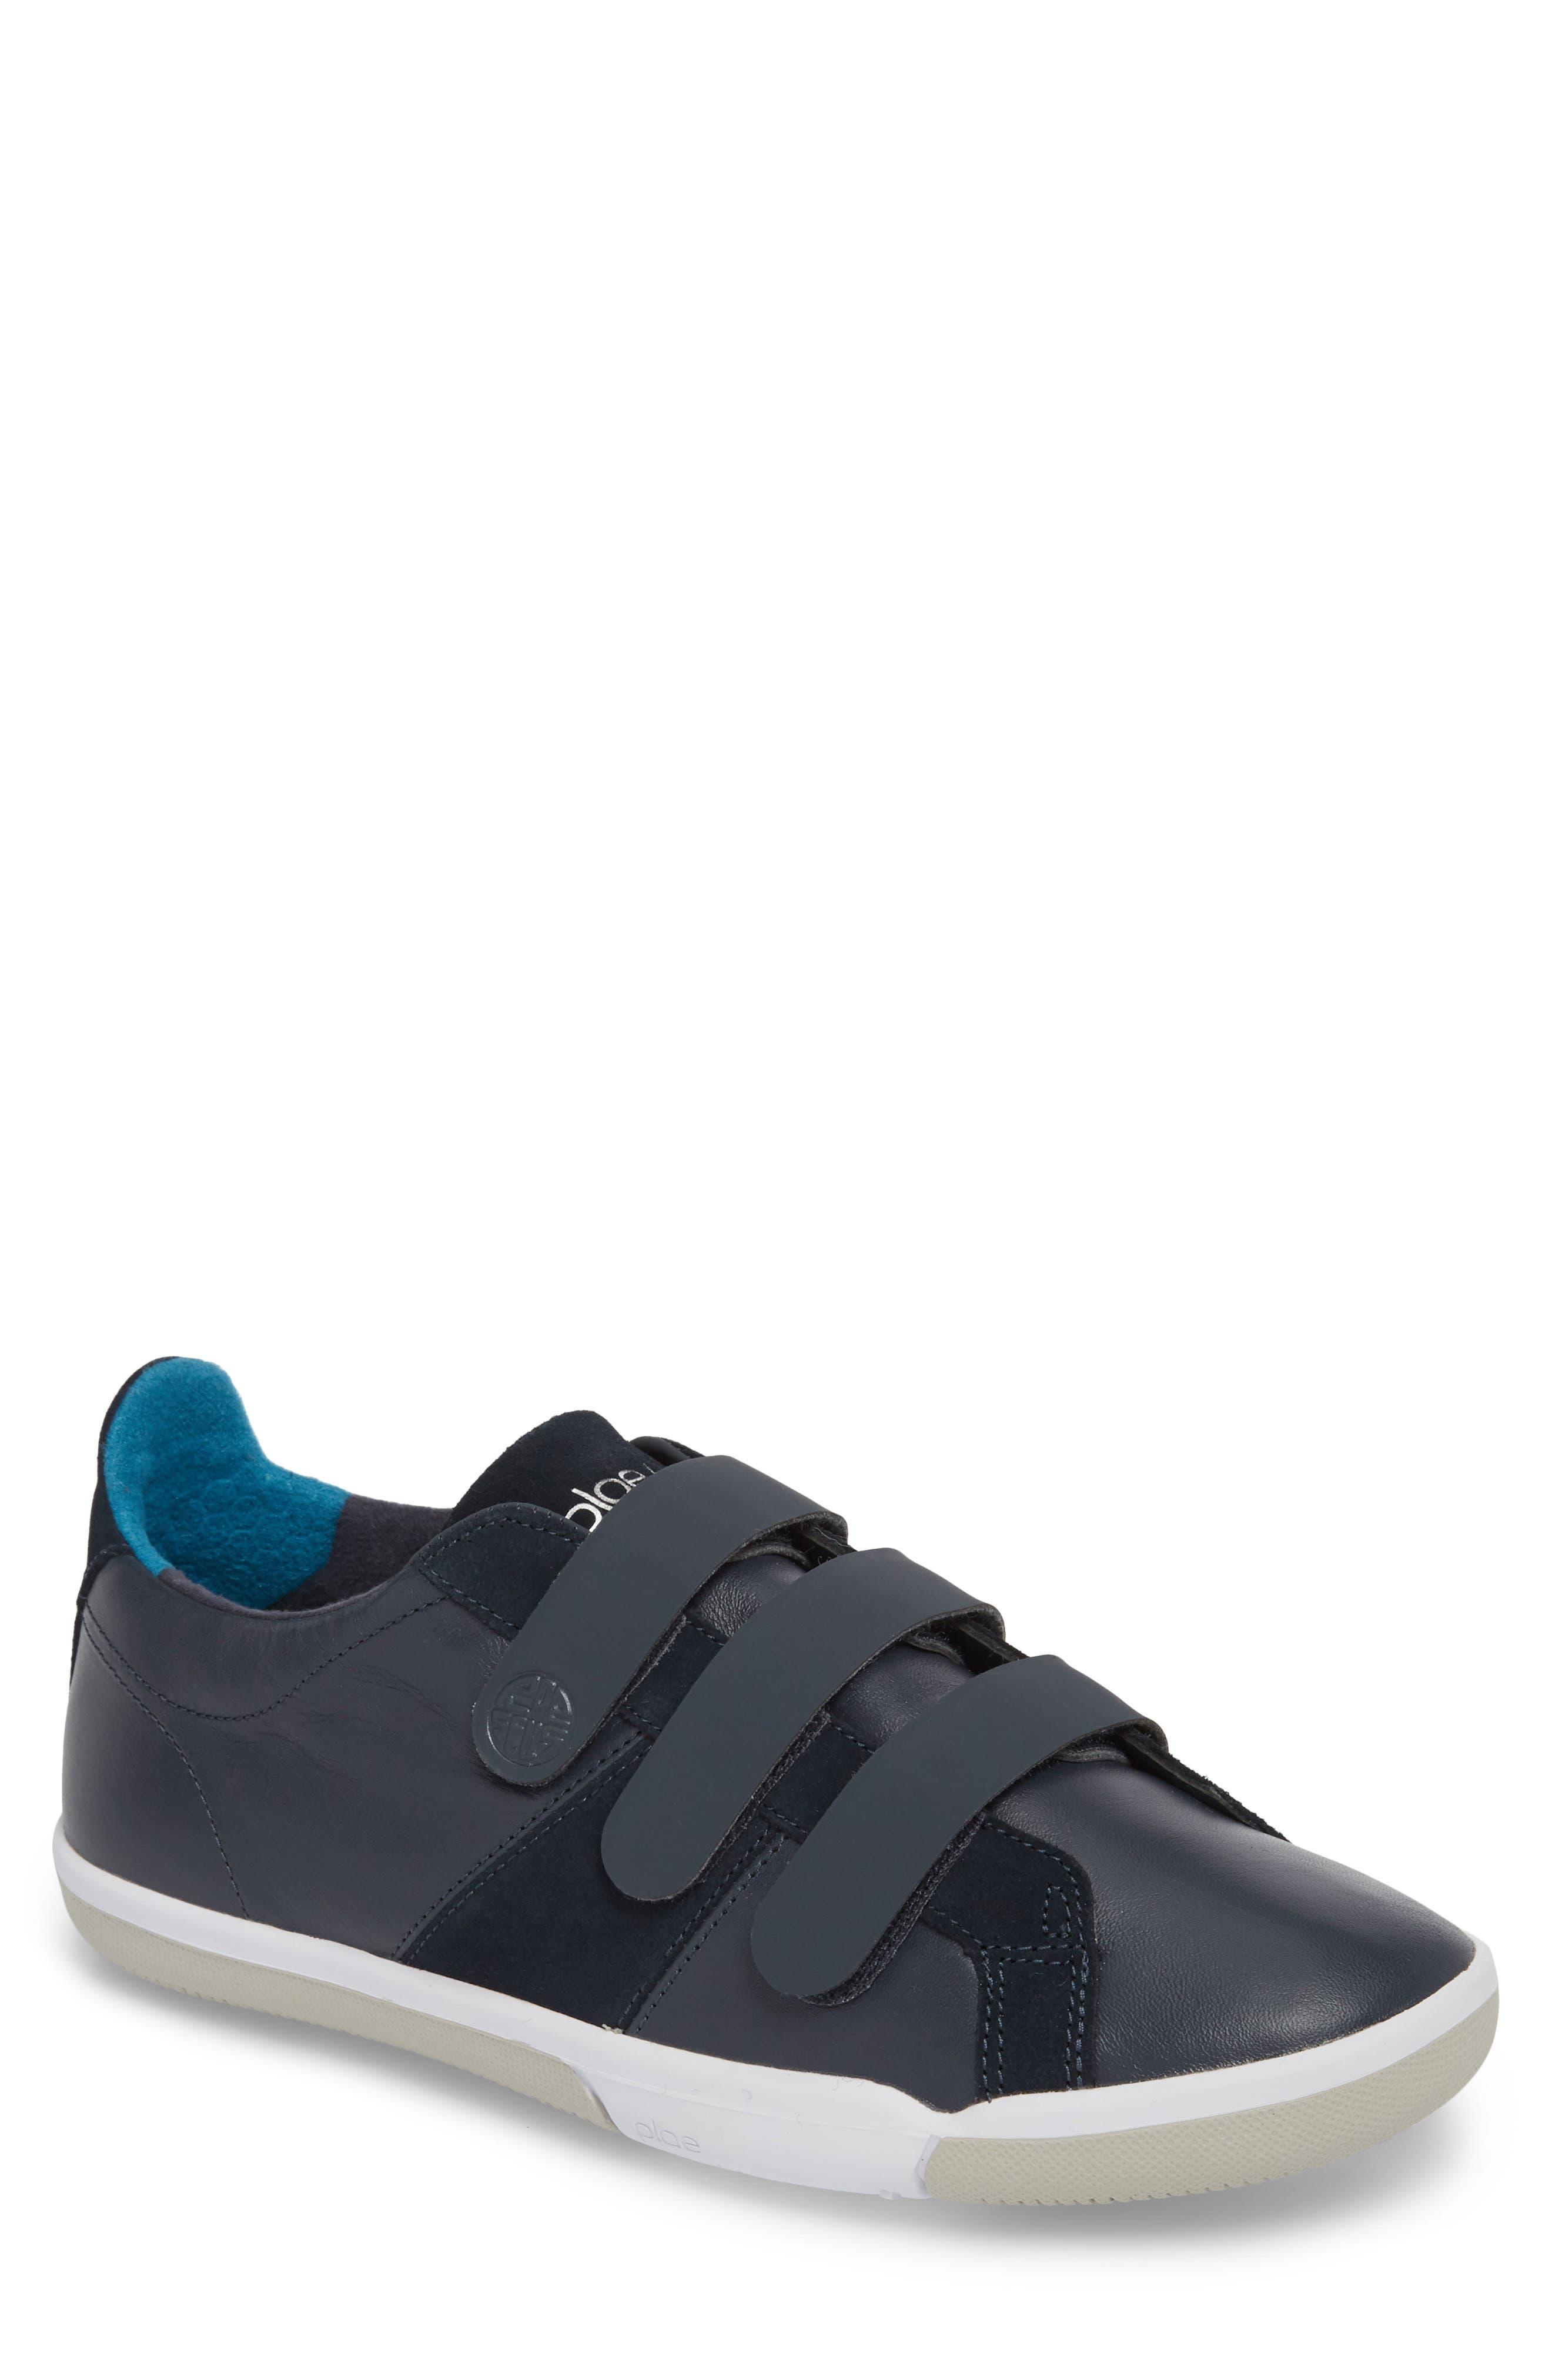 Larkin Low Top Sneaker,                             Main thumbnail 1, color,                             Blue Nights